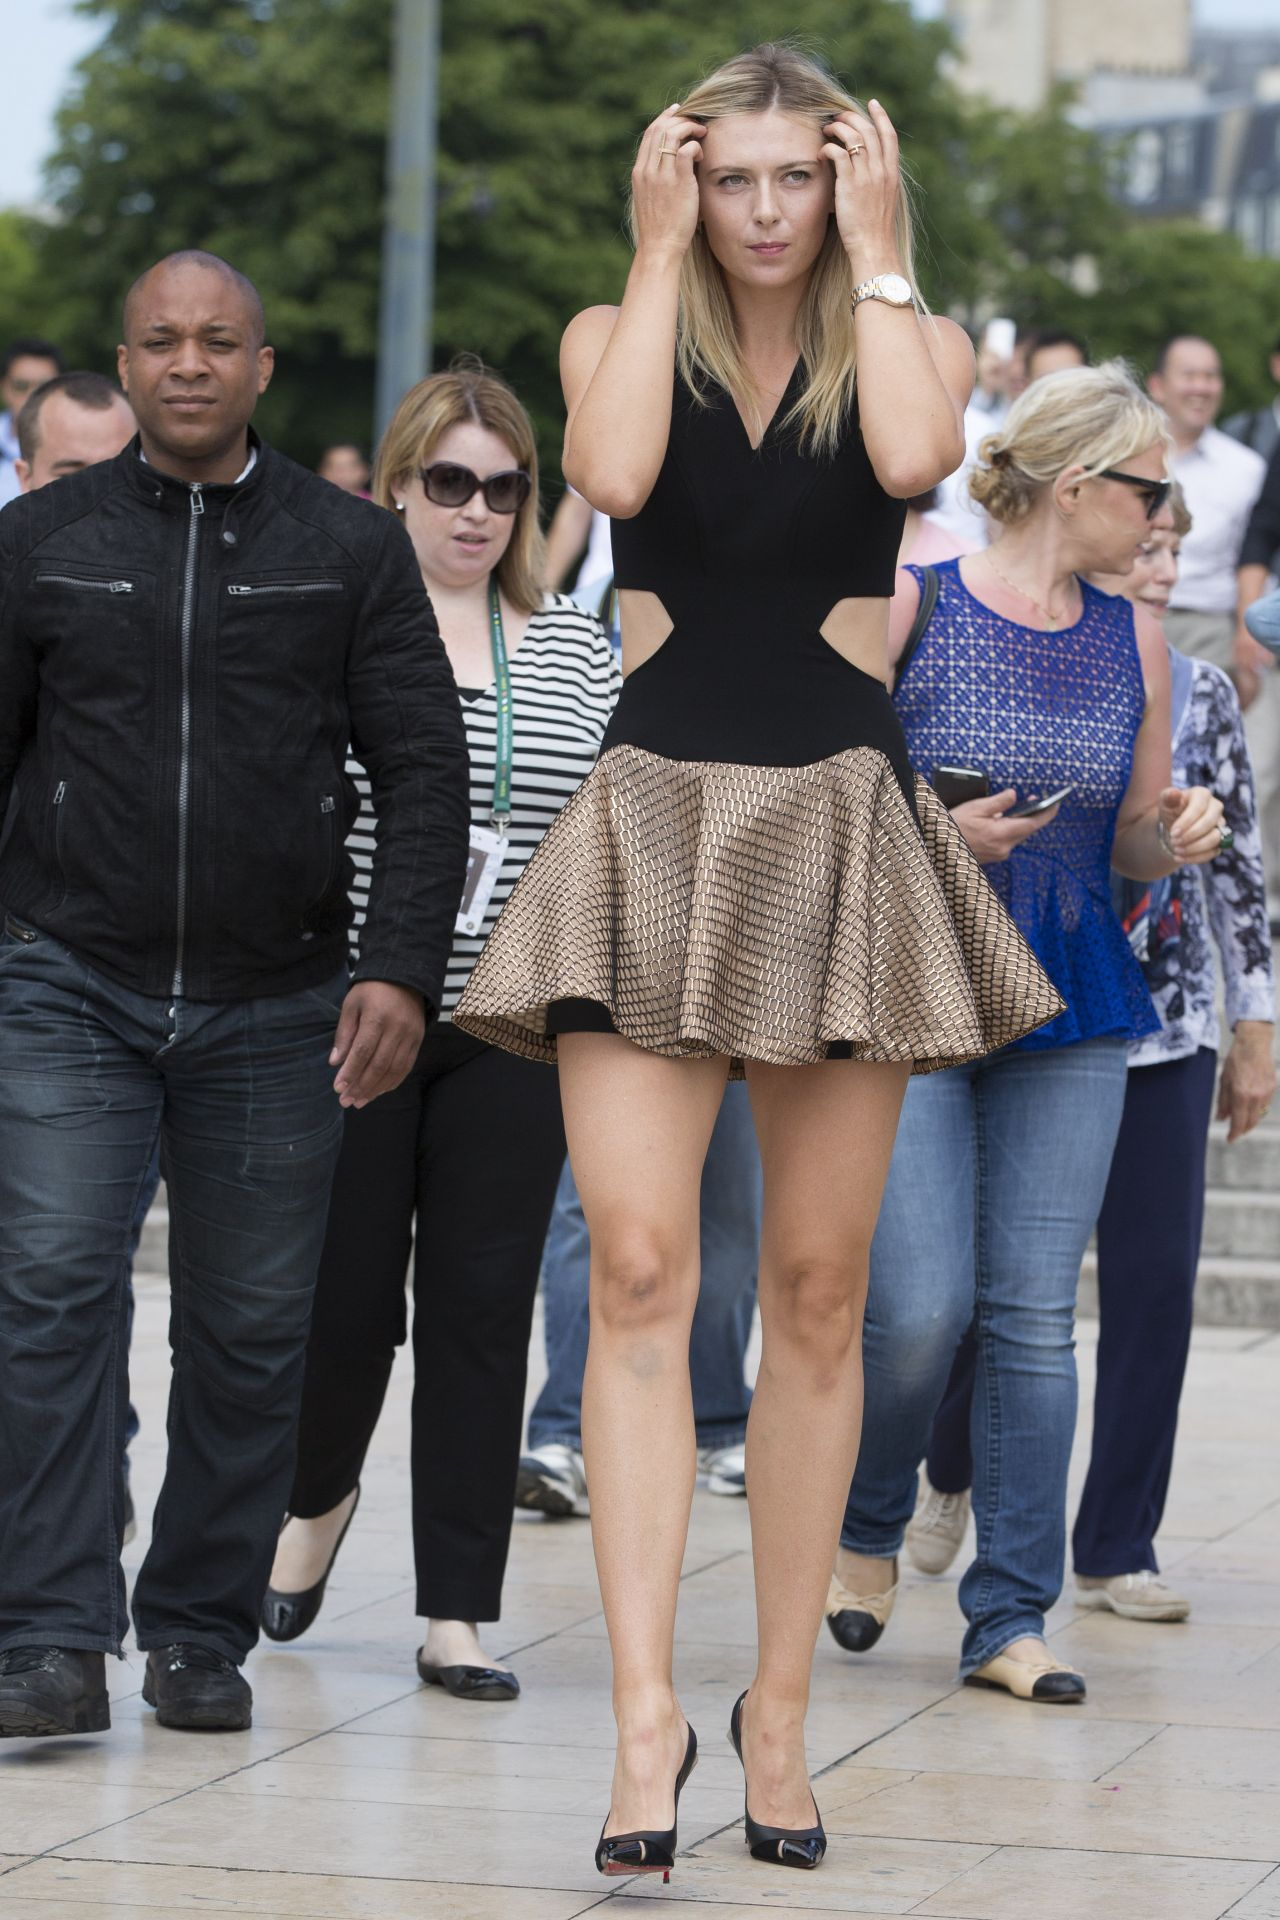 Maria Sharapova – 2014 French Open at Roland Garros – Trophy Photoshoot in Paris